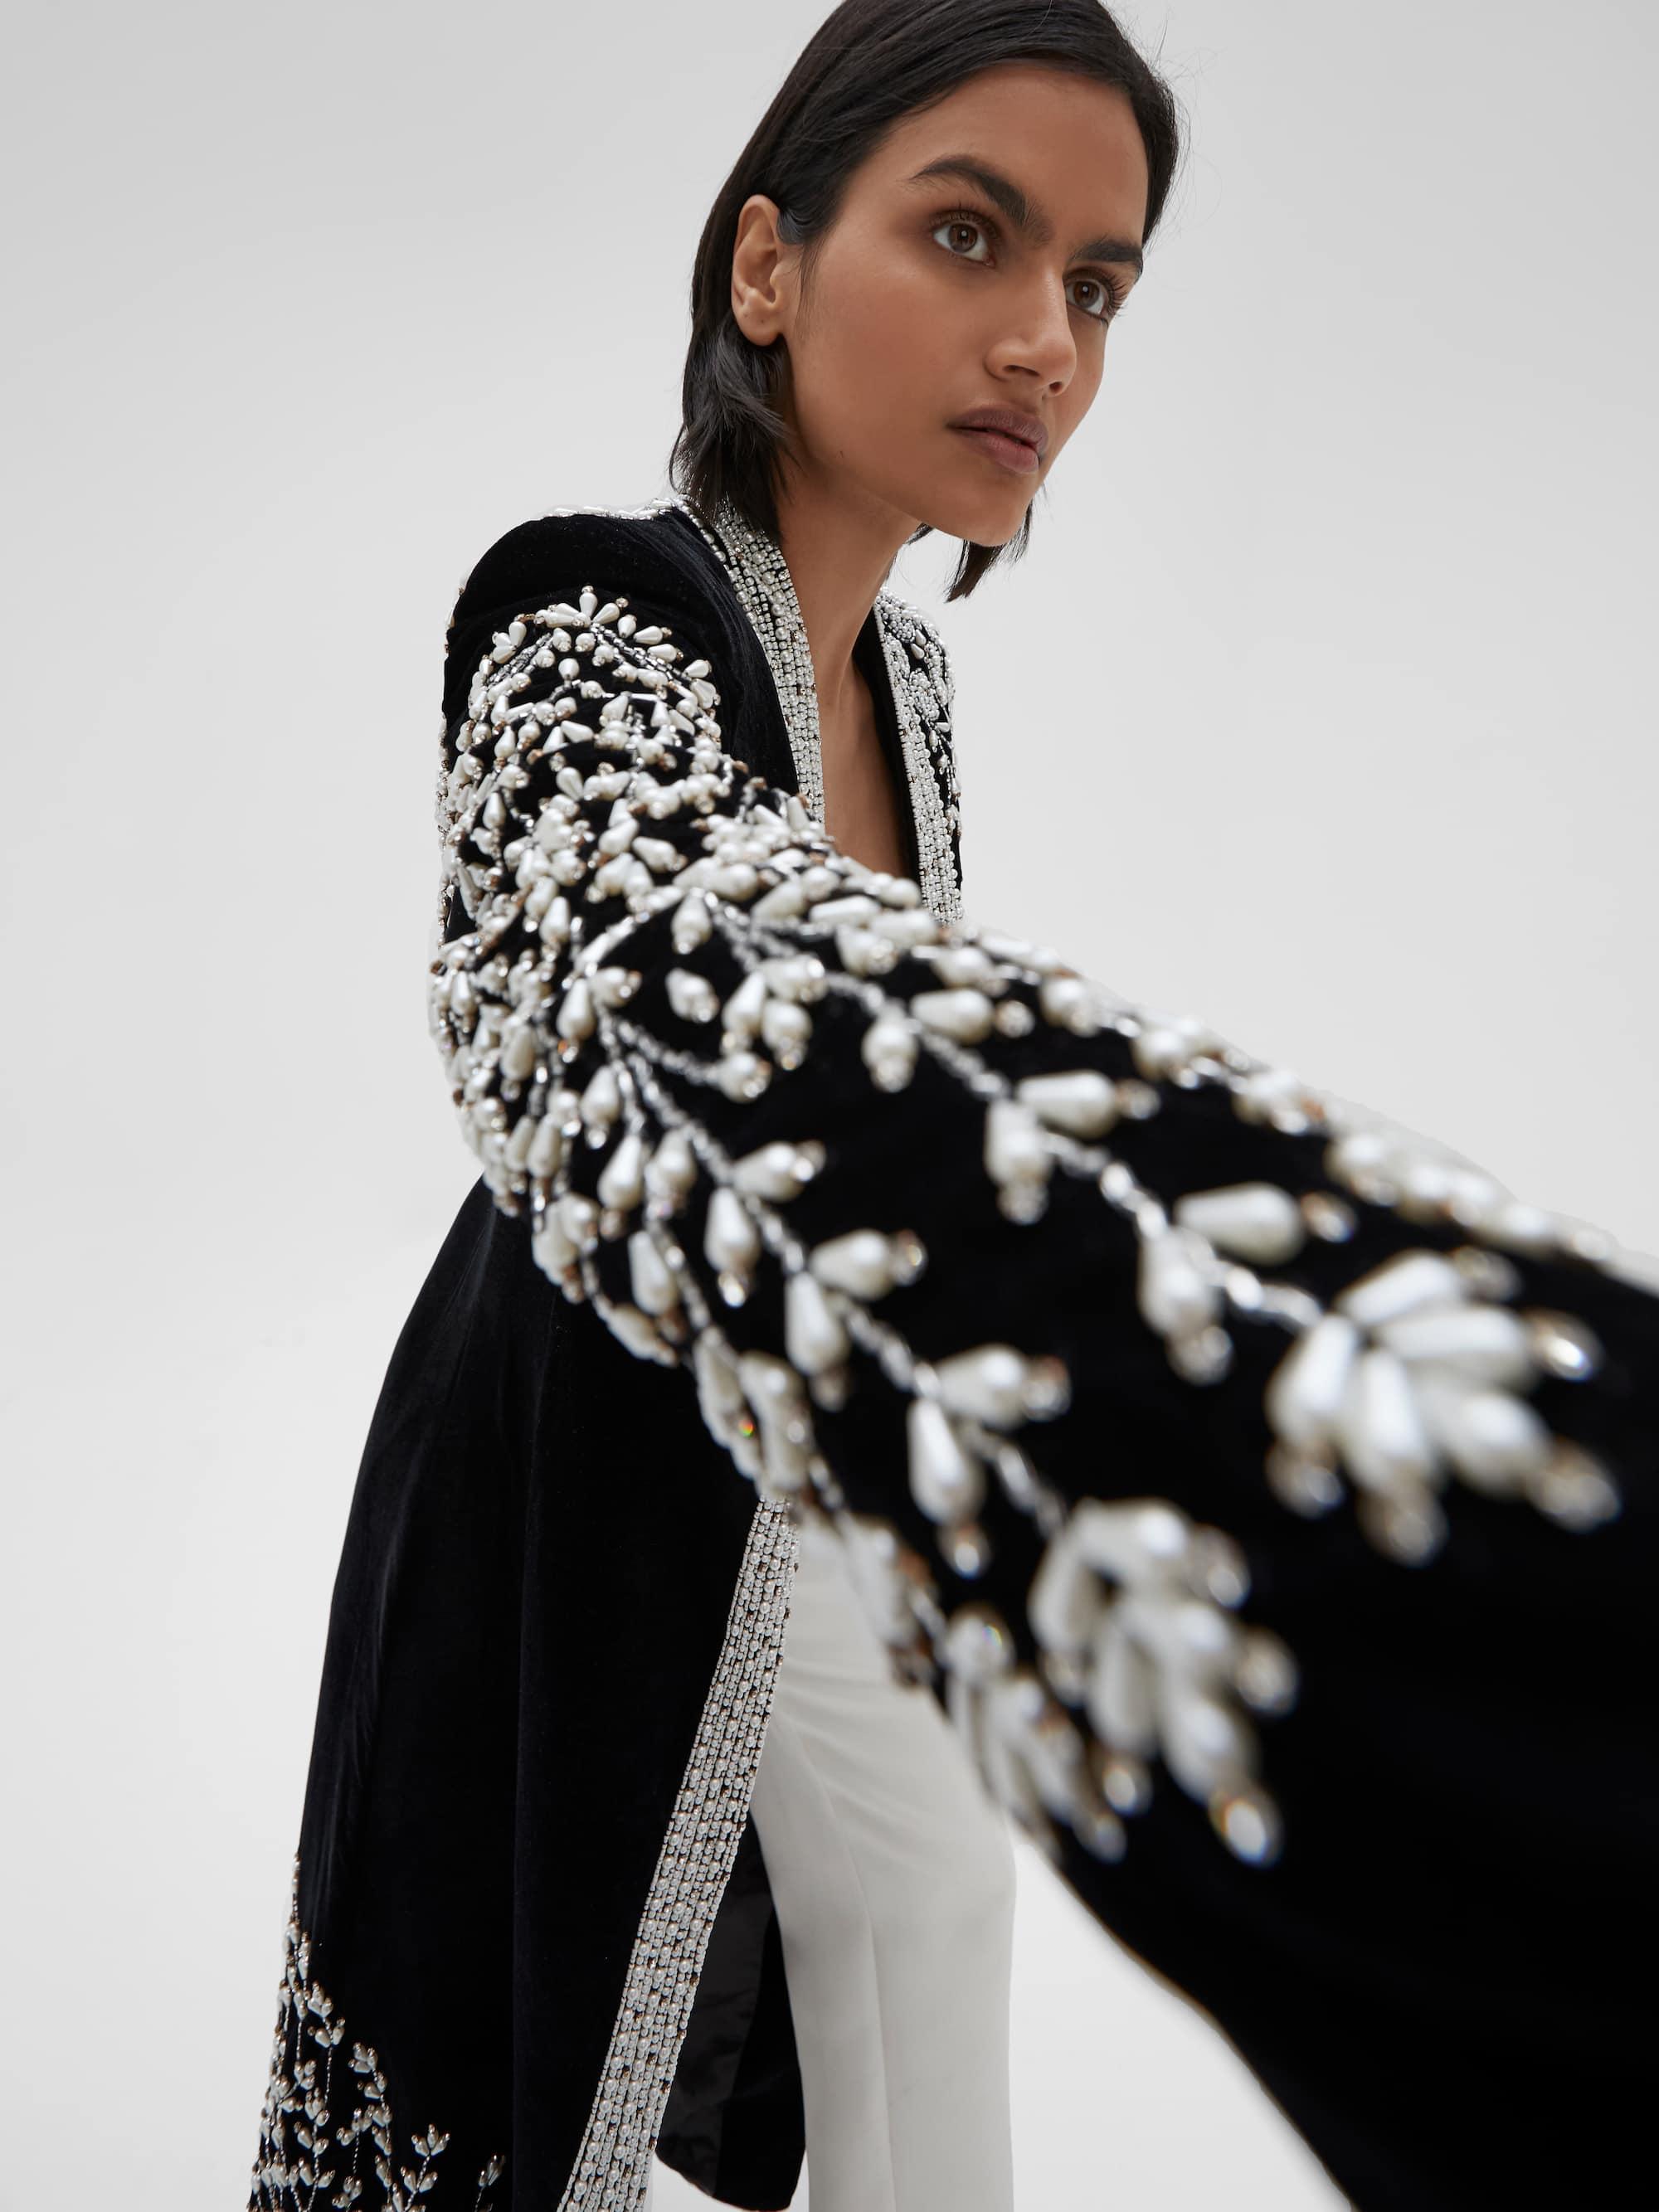 View 5 of model wearing Kamia Kimono in black.